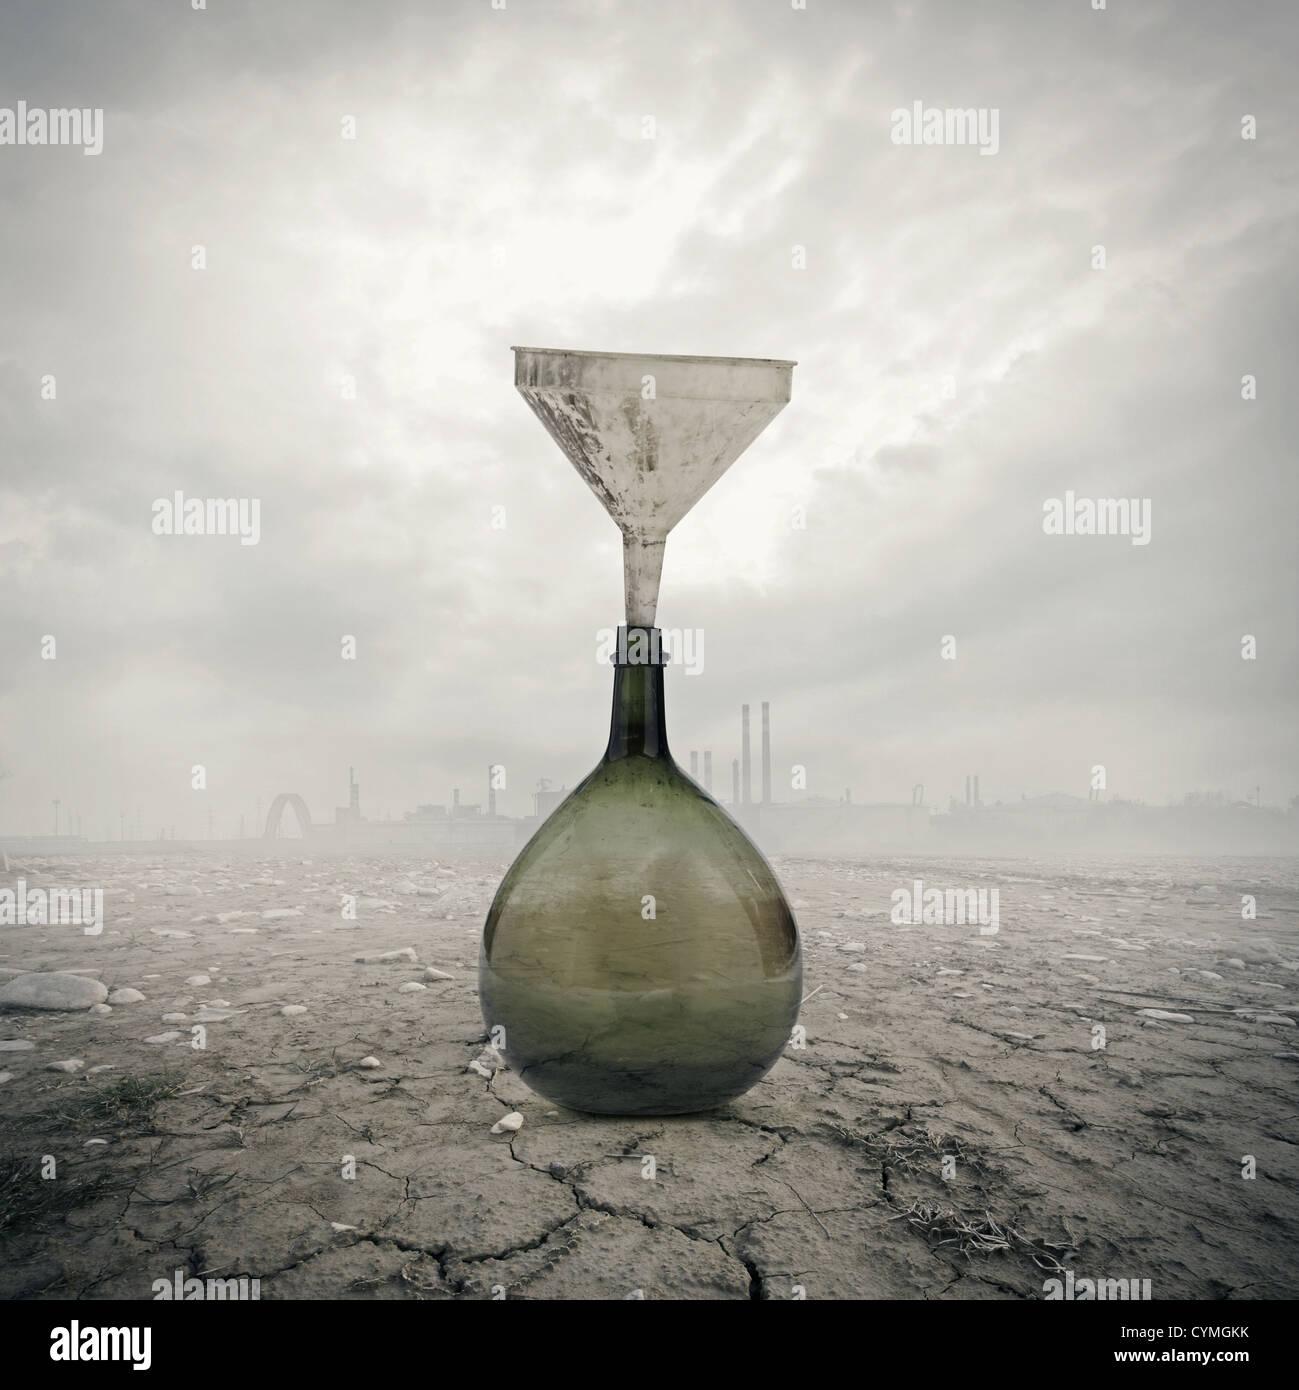 Konzept der globalen Erwärmung: Umweltschäden Stockbild